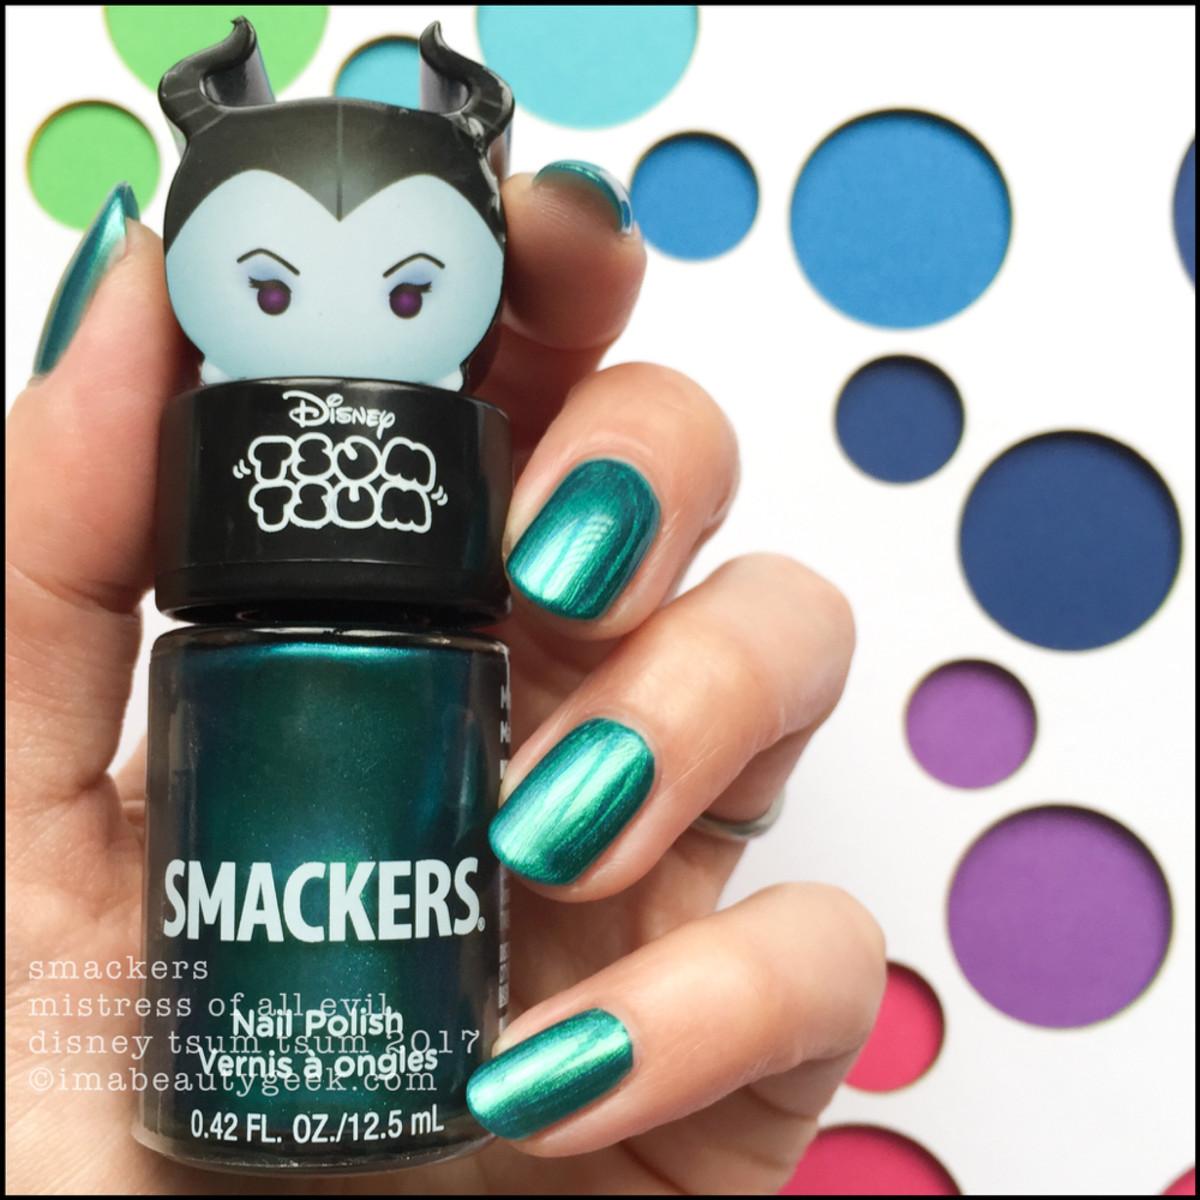 Lip Smackers Tsum Tsum Polish Mistress of All Evil